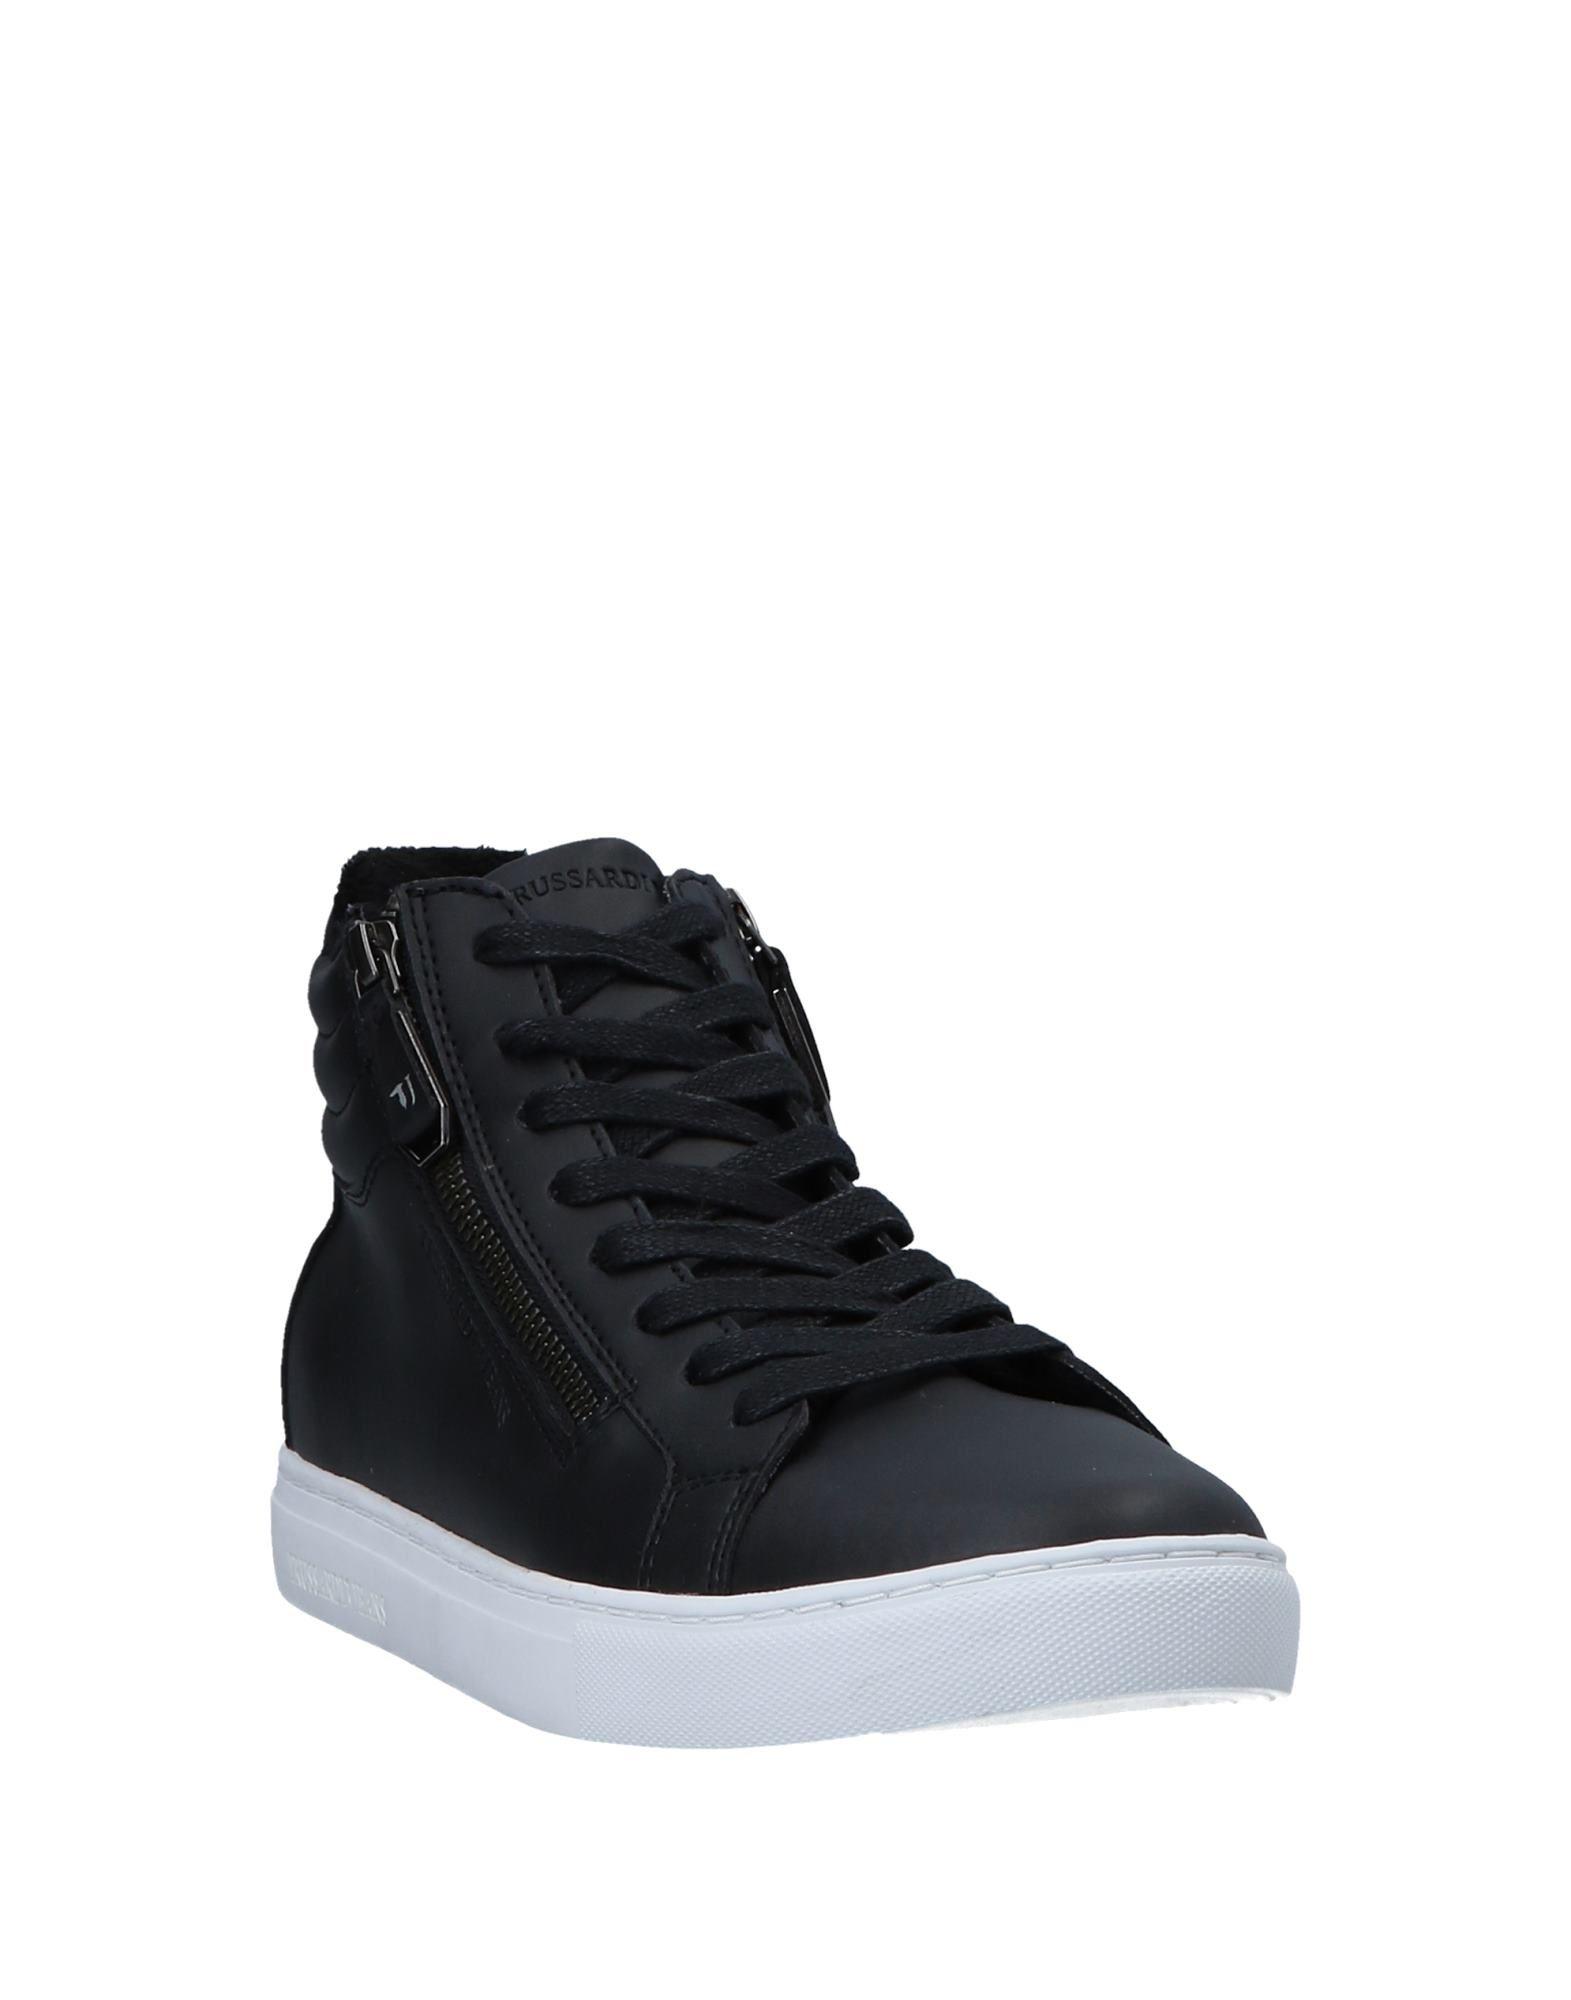 Rabatt echte Schuhe Herren Trussardi Jeans Sneakers Herren Schuhe  11546094BU 898cd6